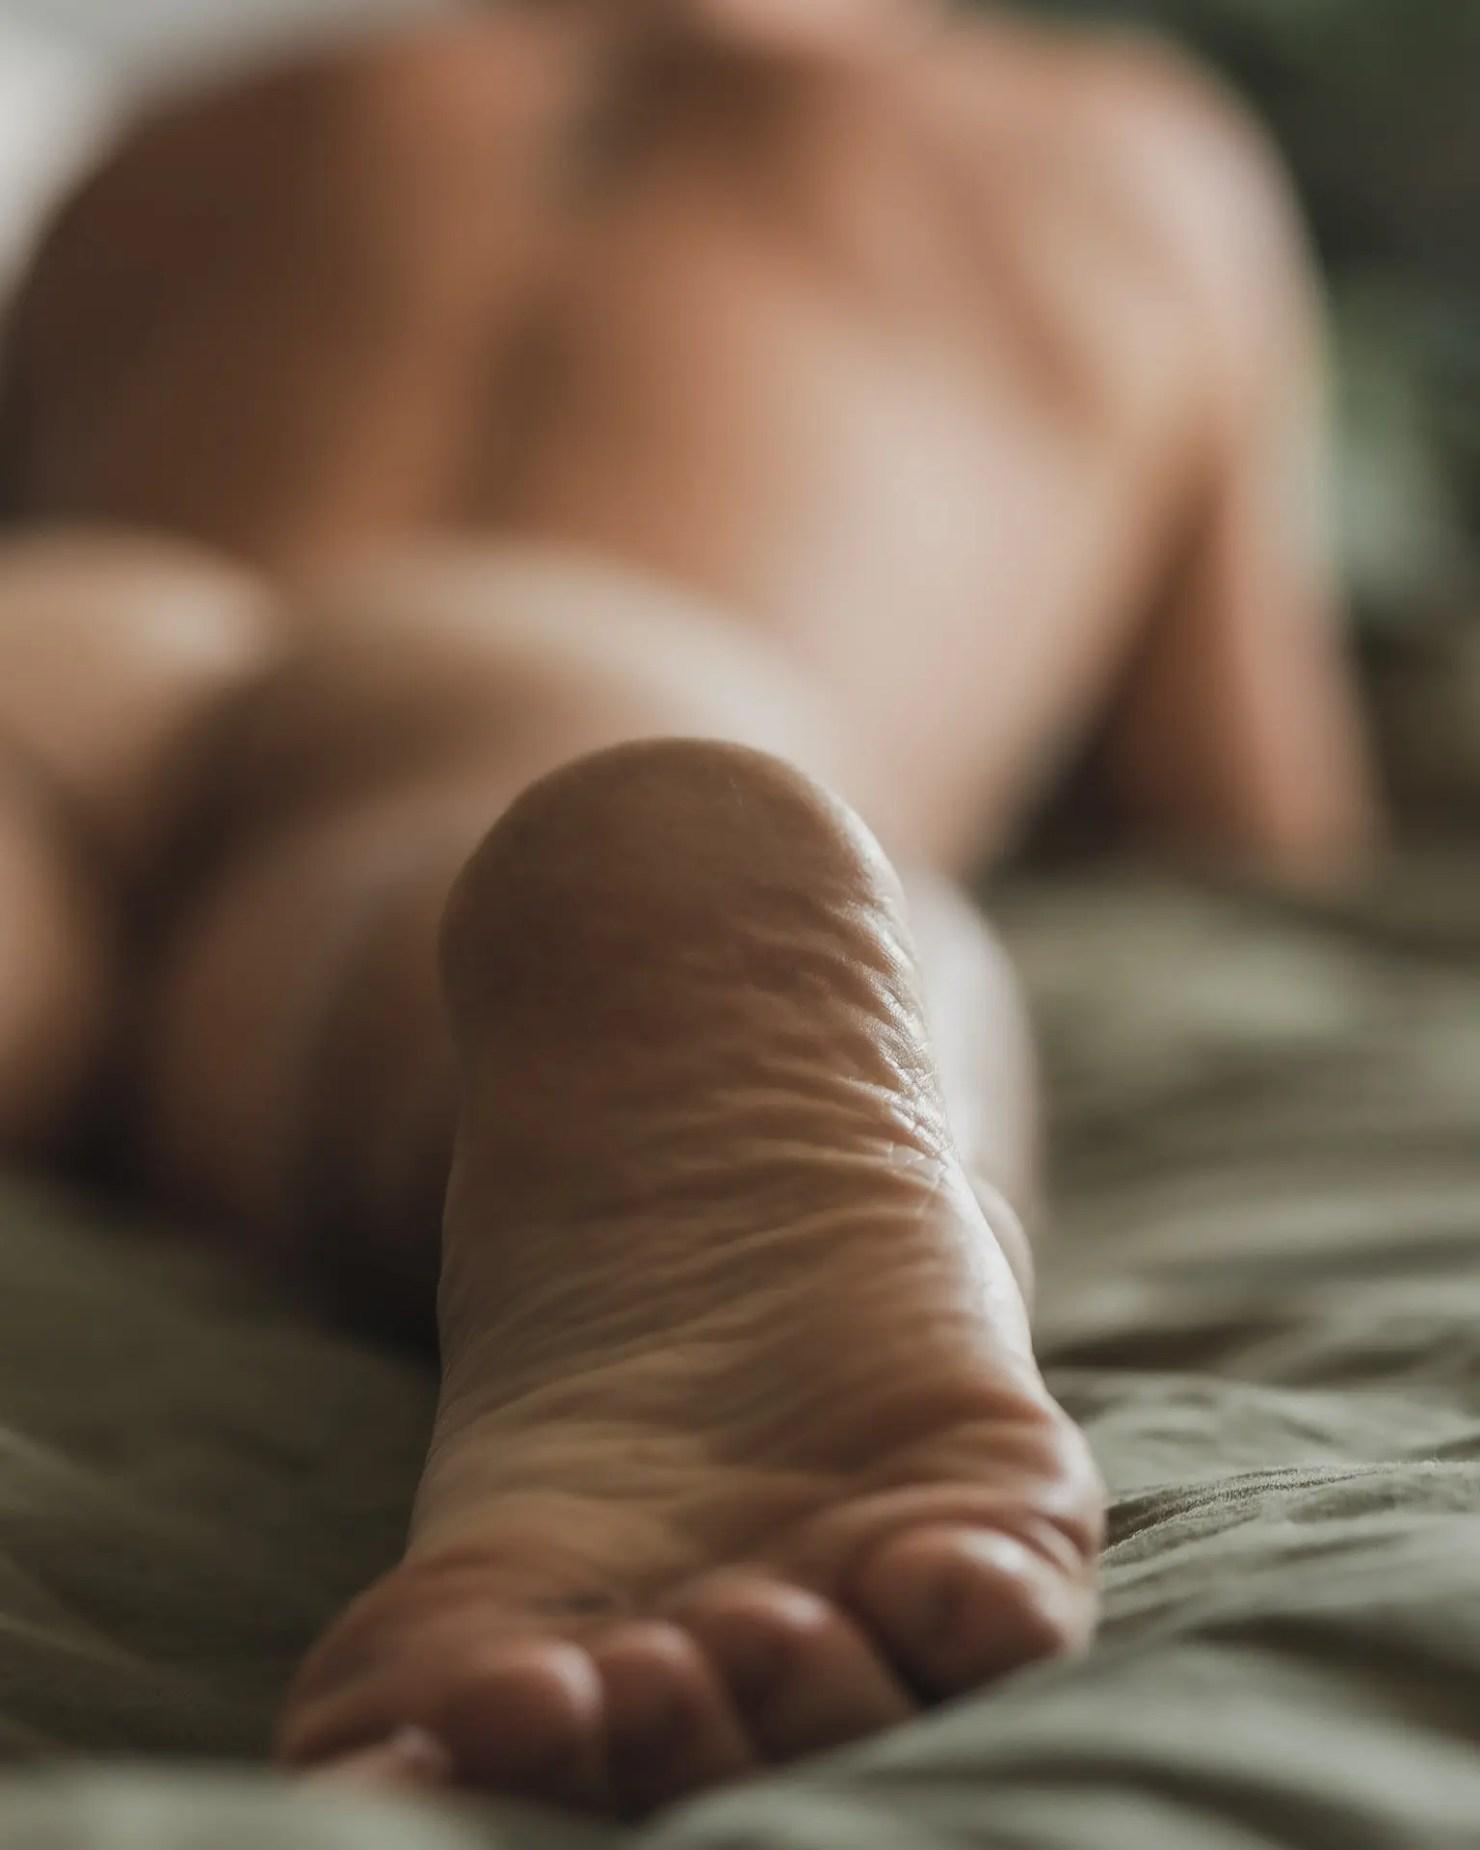 Männerfüße, Pflegetipps, schwul